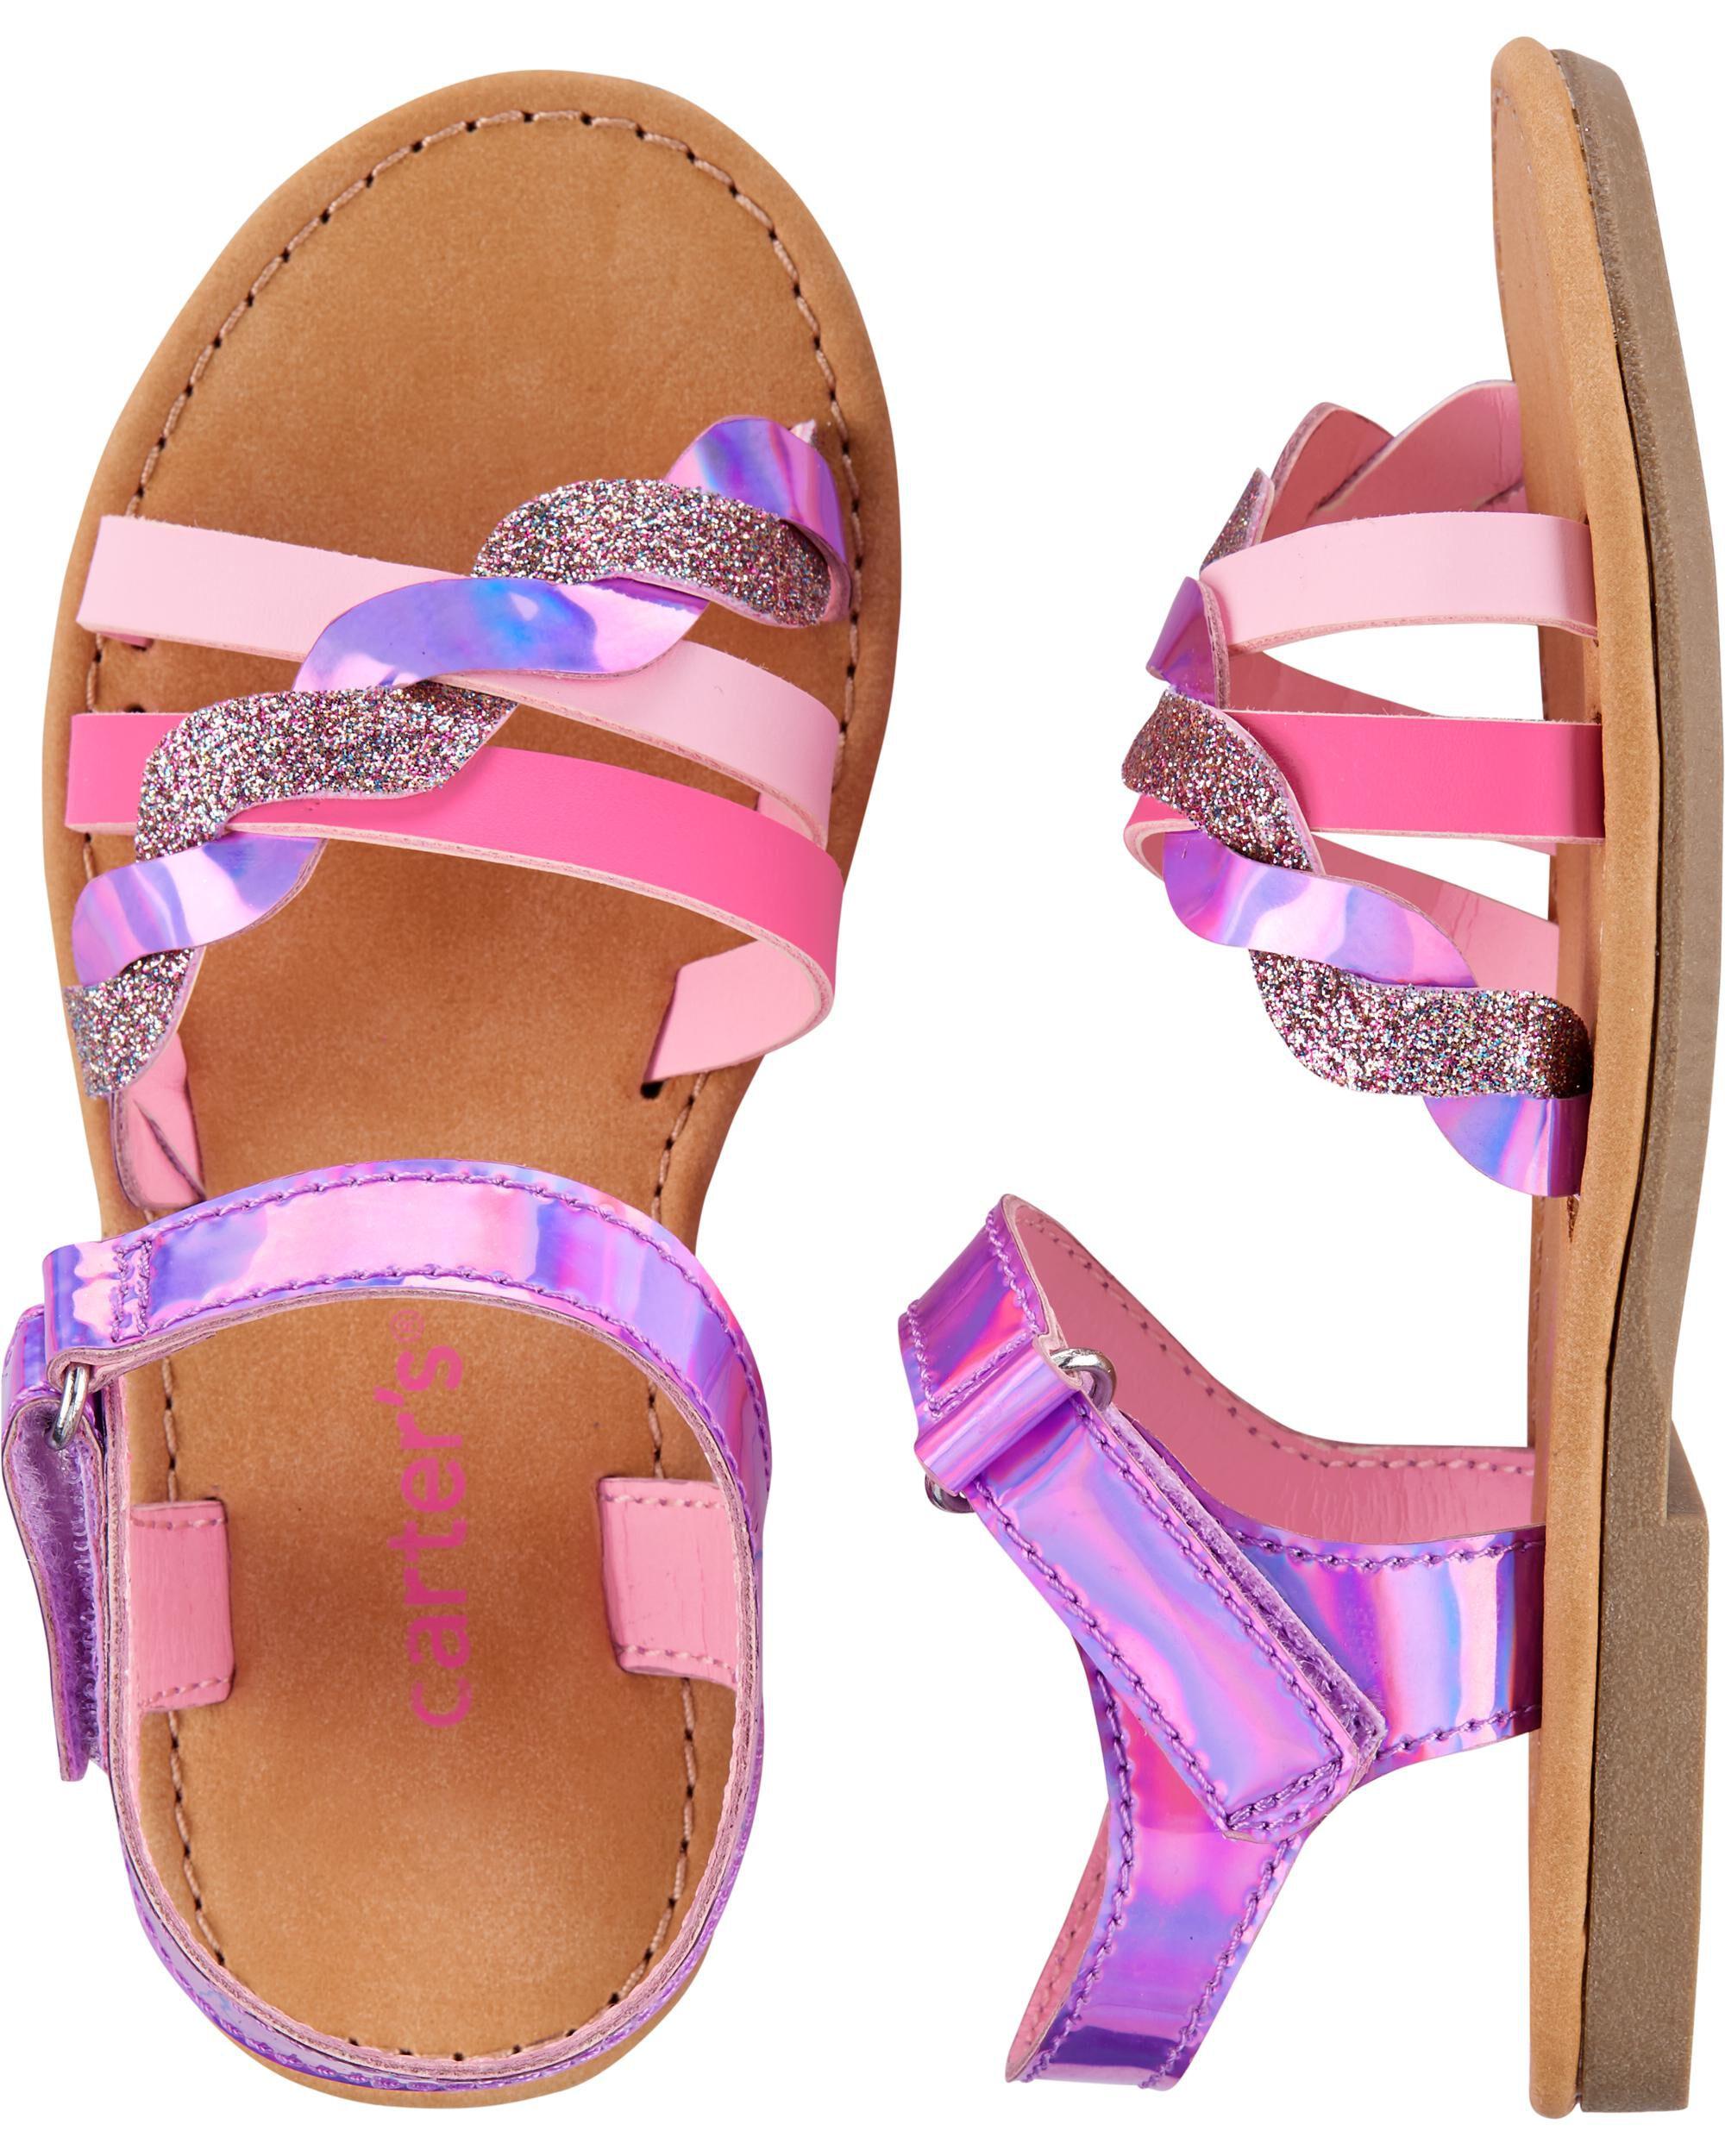 Glitter Strappy Sandals | carters.com